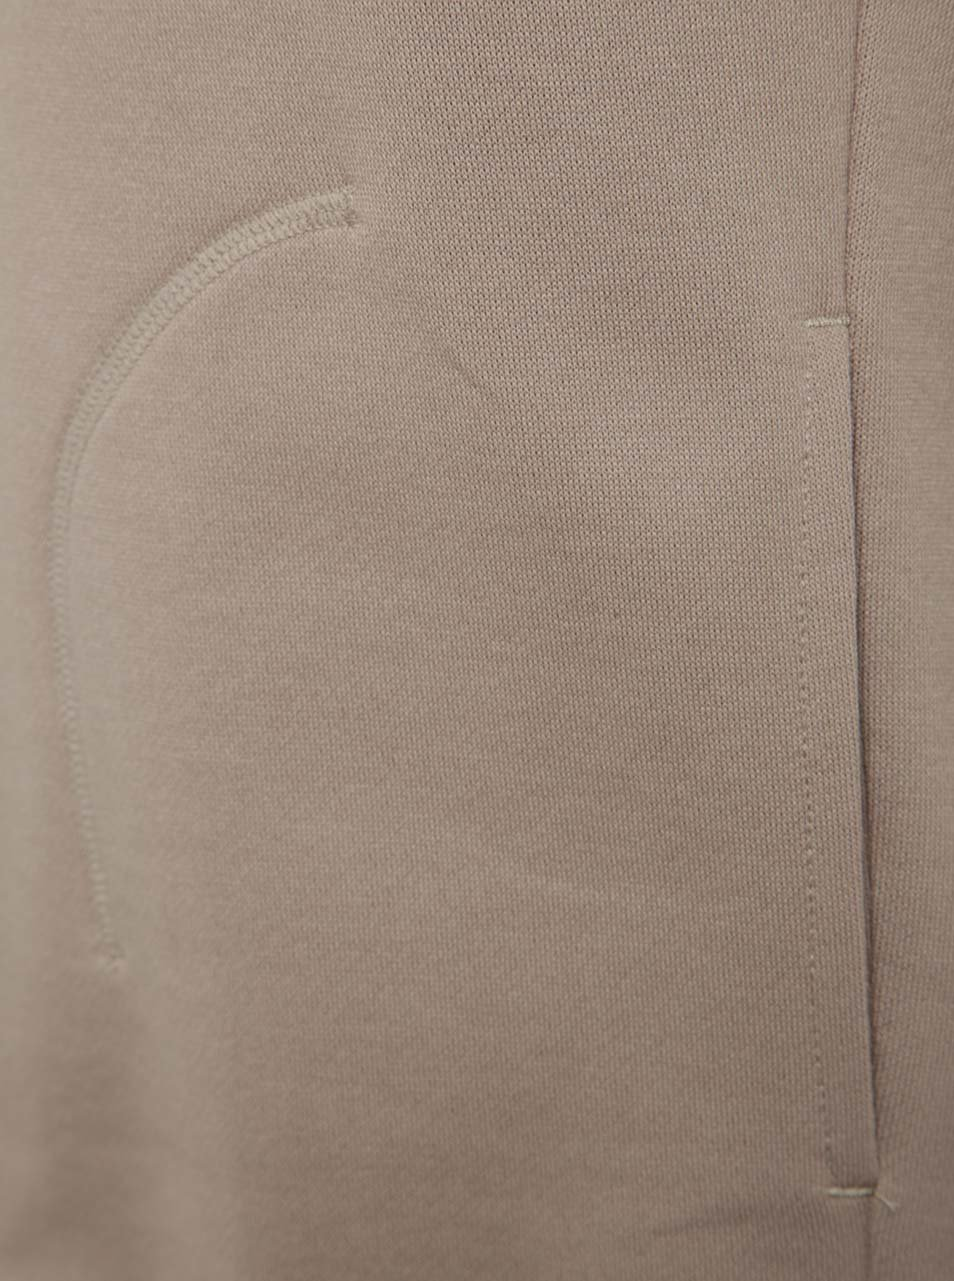 5a9915c3051 Béžová pánská mikina s reflexním prvkem adidas Originals XBYO ...